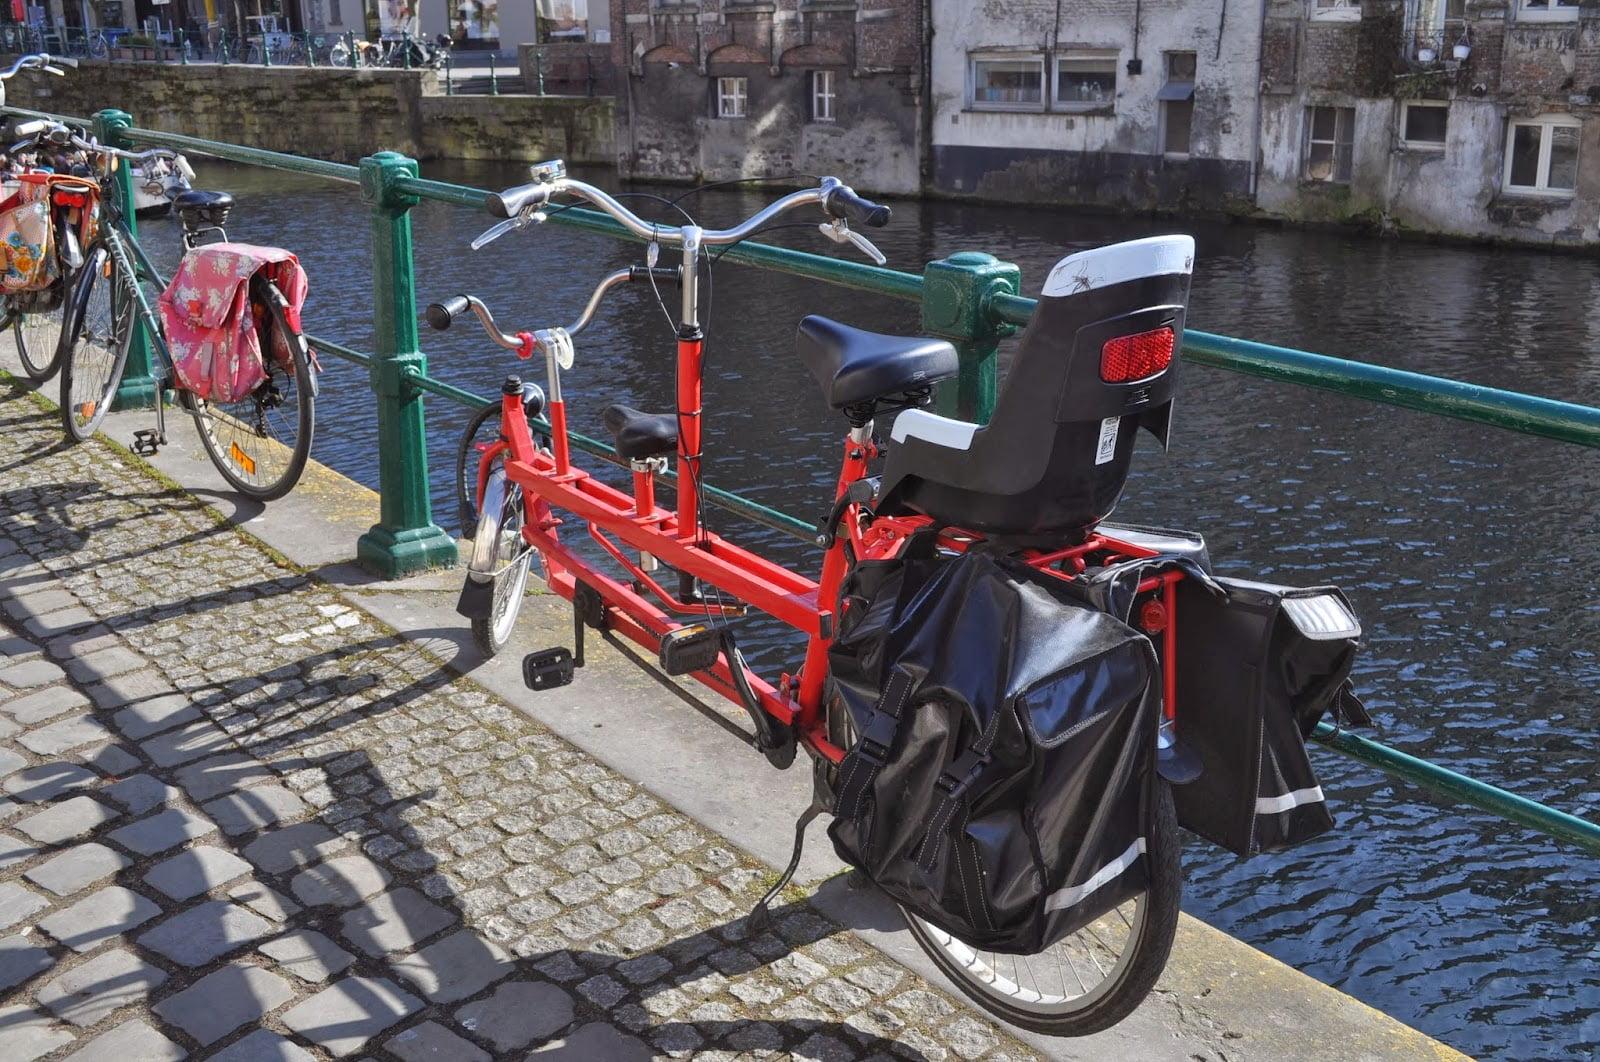 tandem biciclette a tre posti